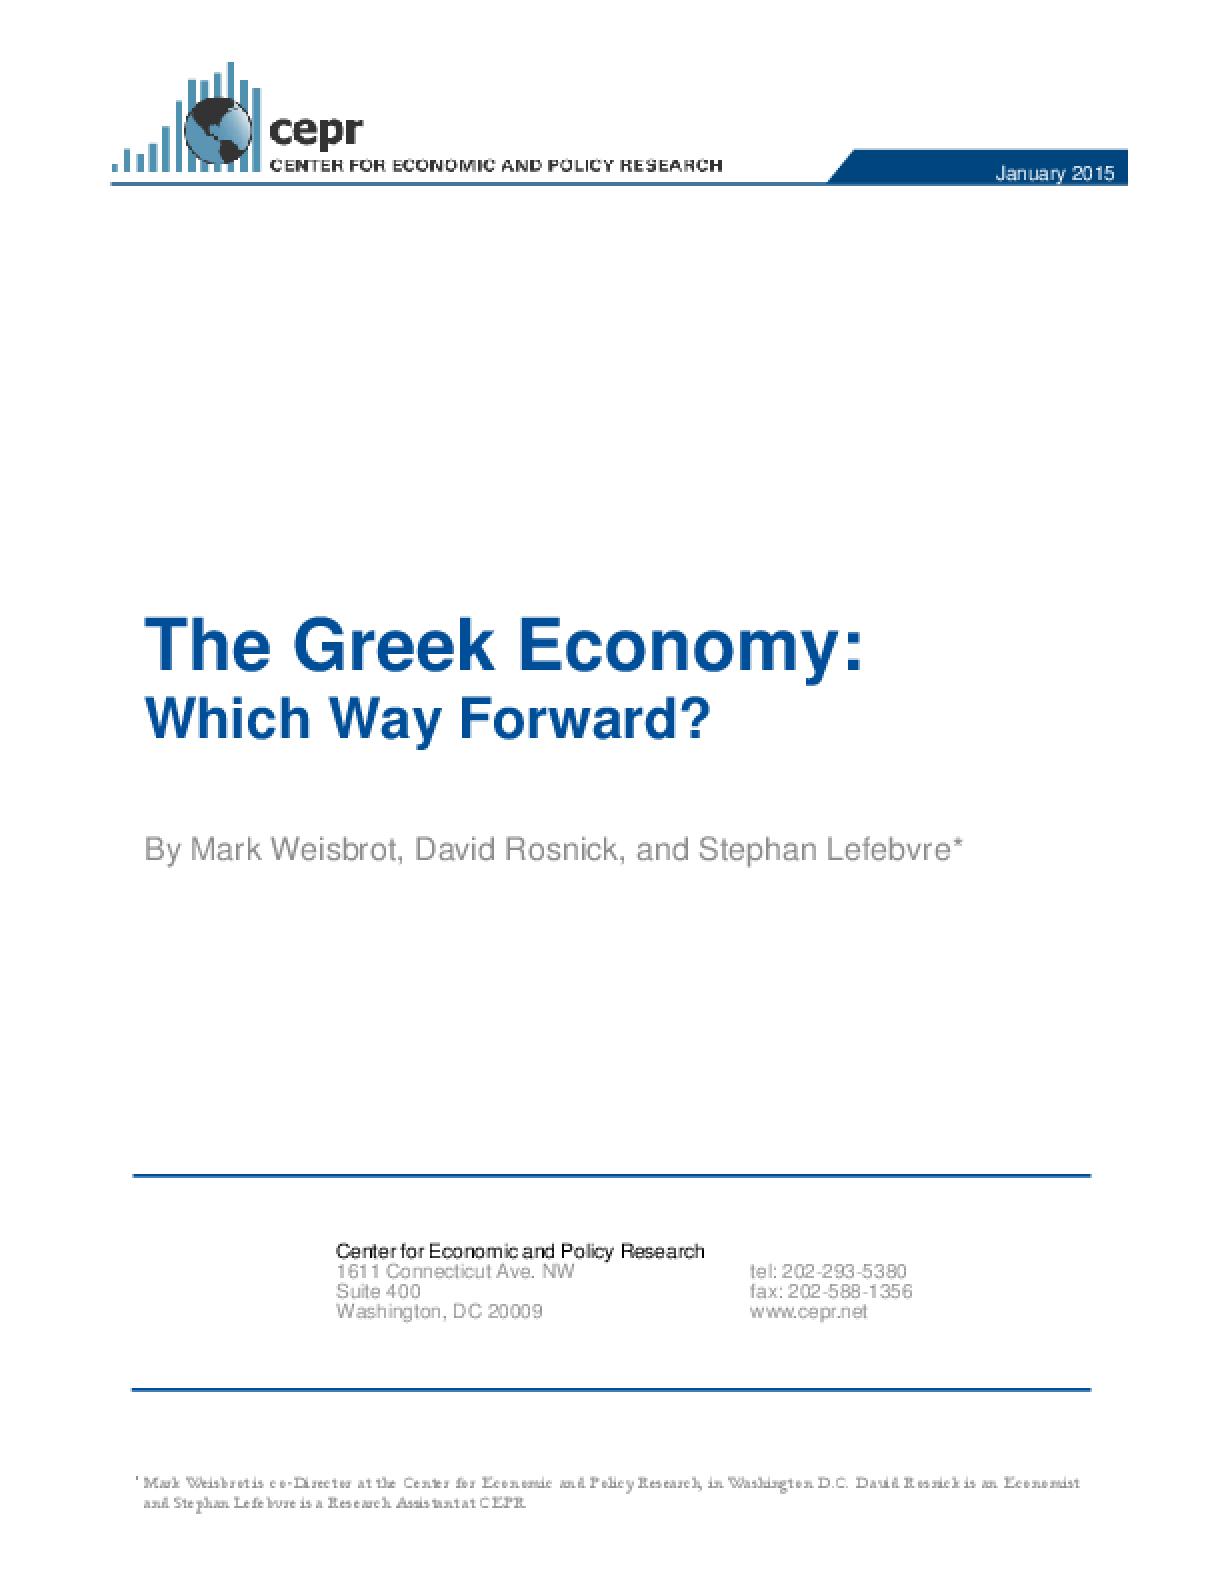 The Greek Economy: Which Way Forward?